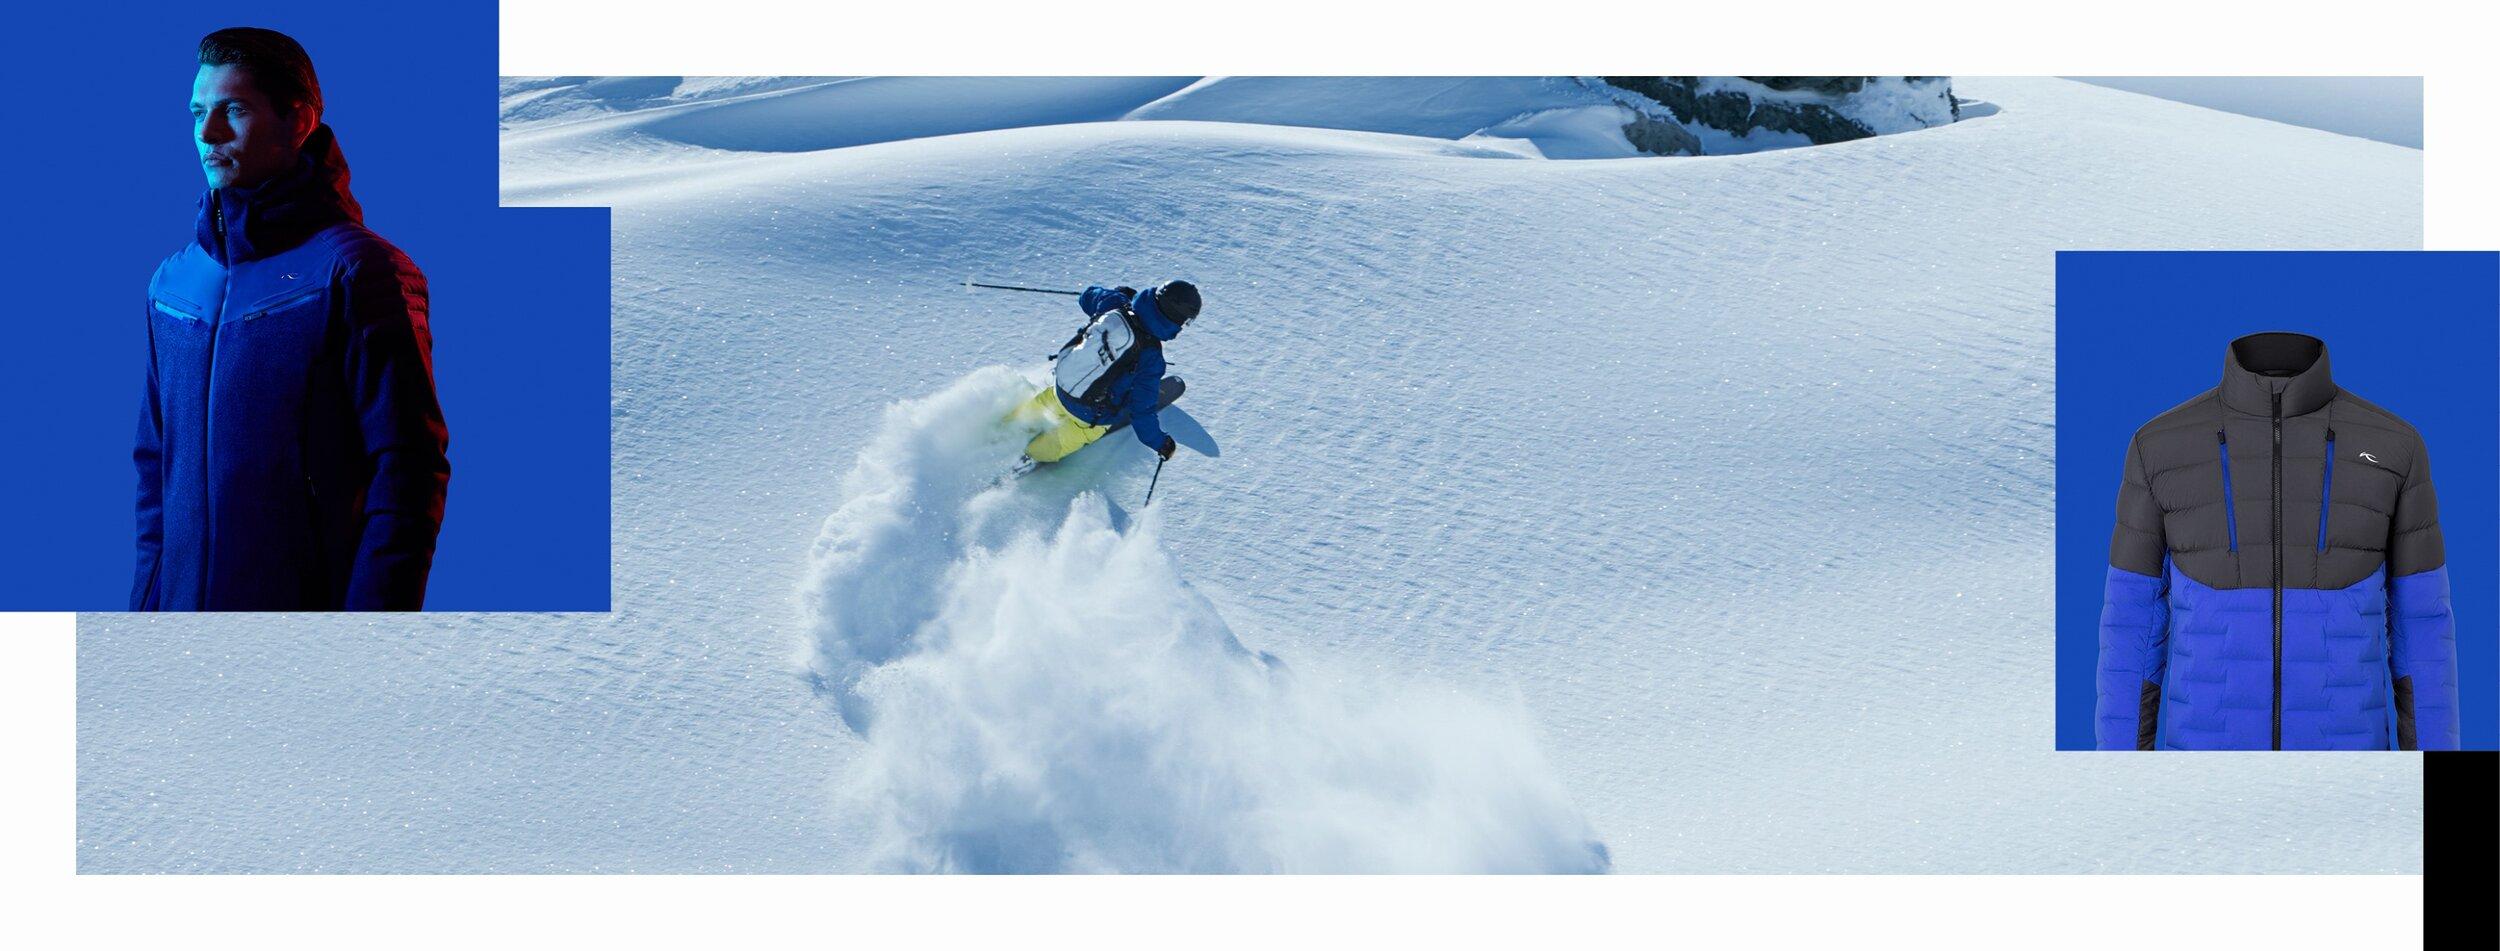 KJUS, image at www.kjus.com